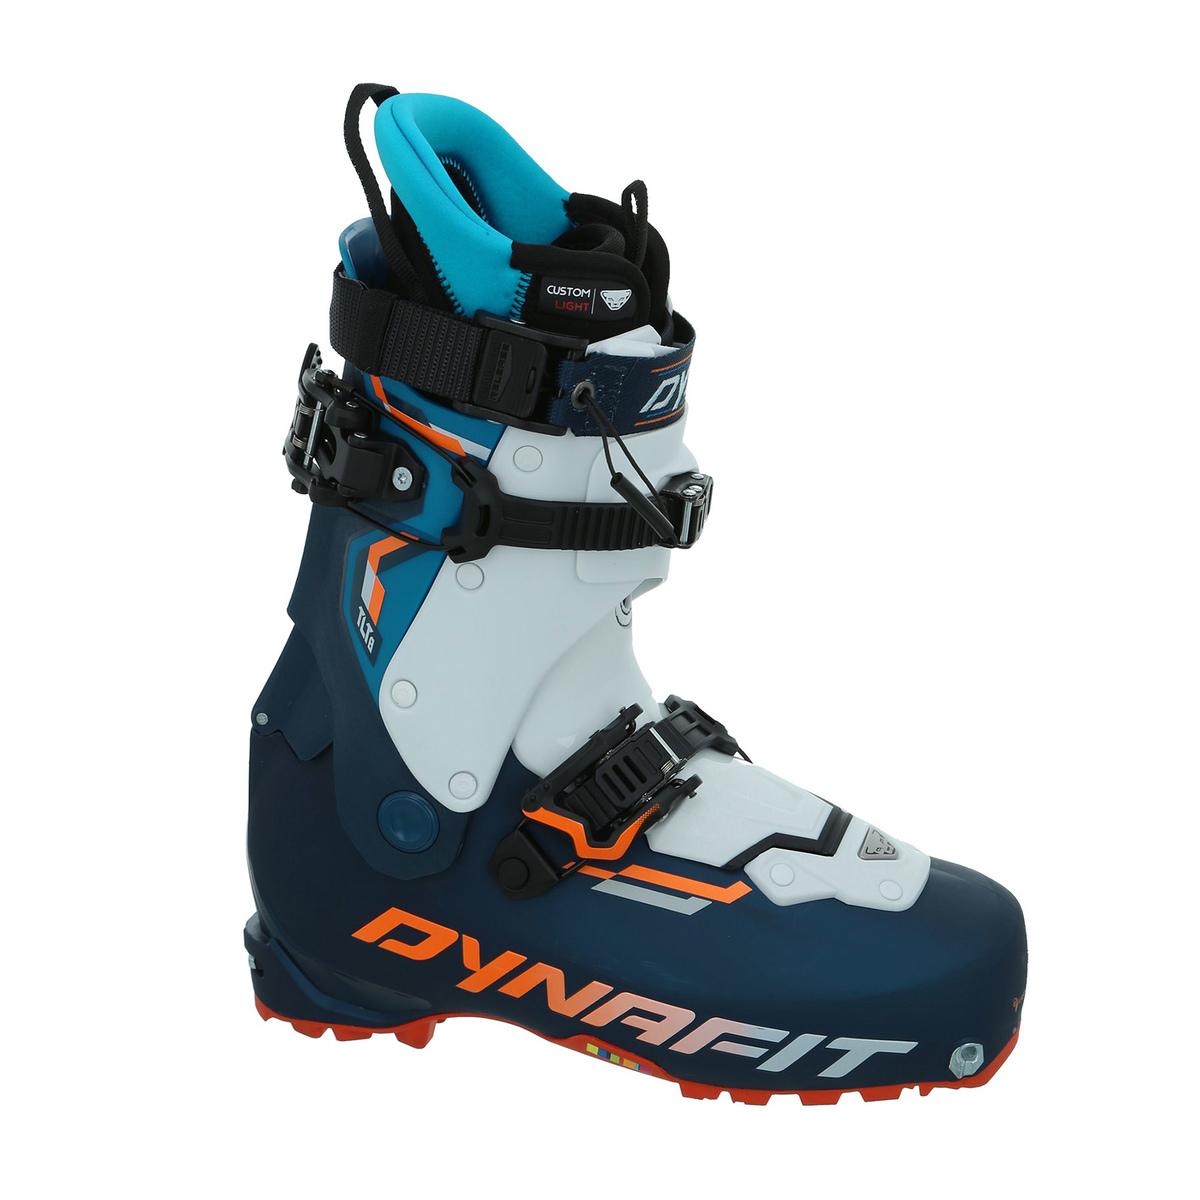 Prezzi Dynafit tlt 8 expedition cl